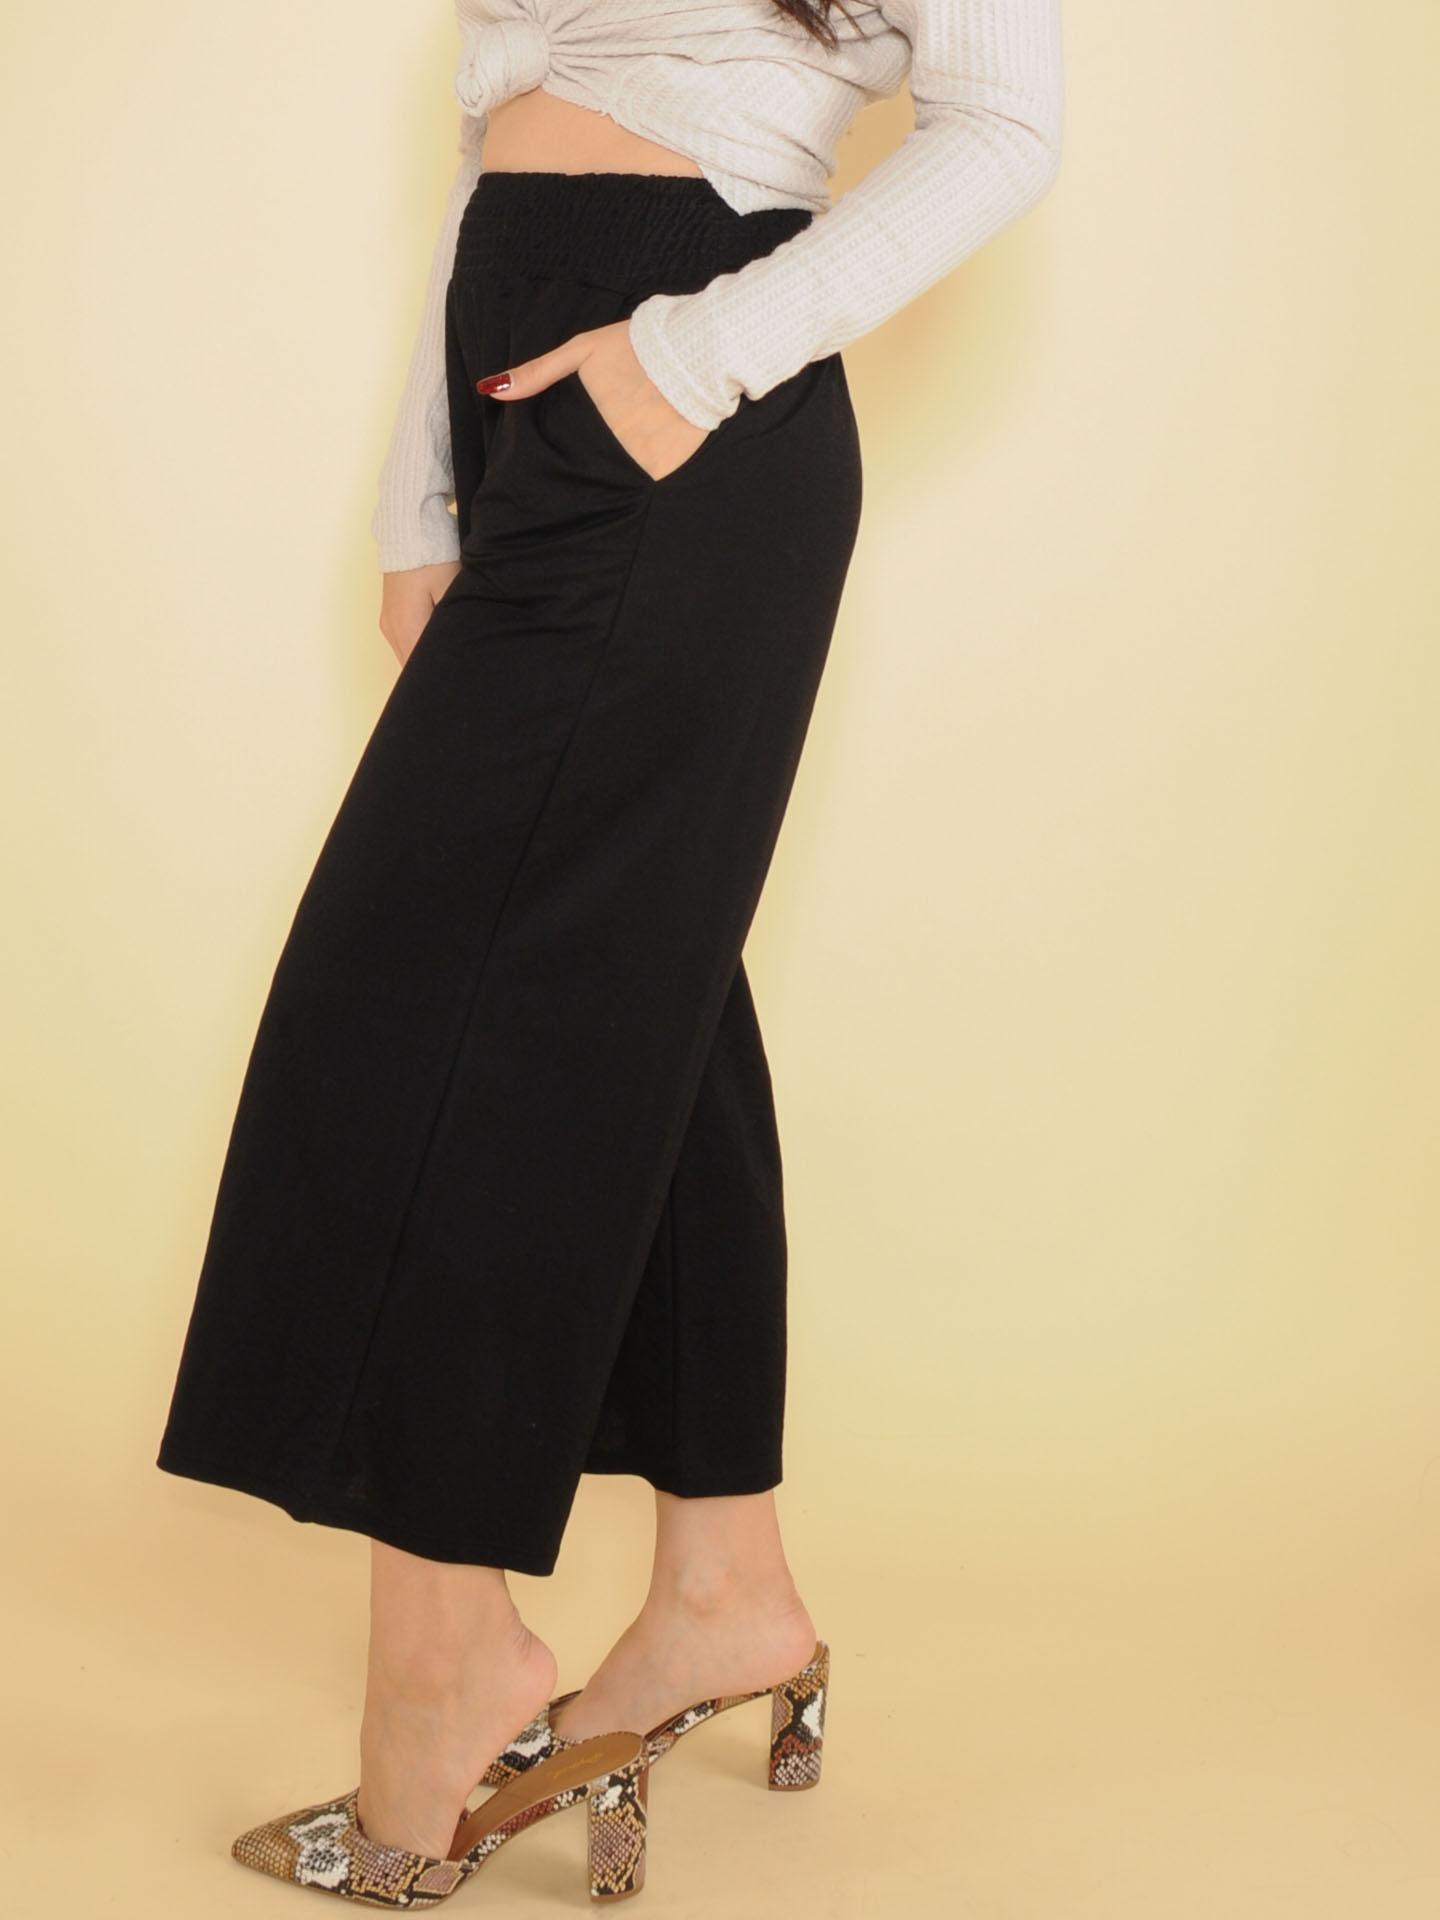 High Rise Flowy Smocked Black Nina Comfy Pants